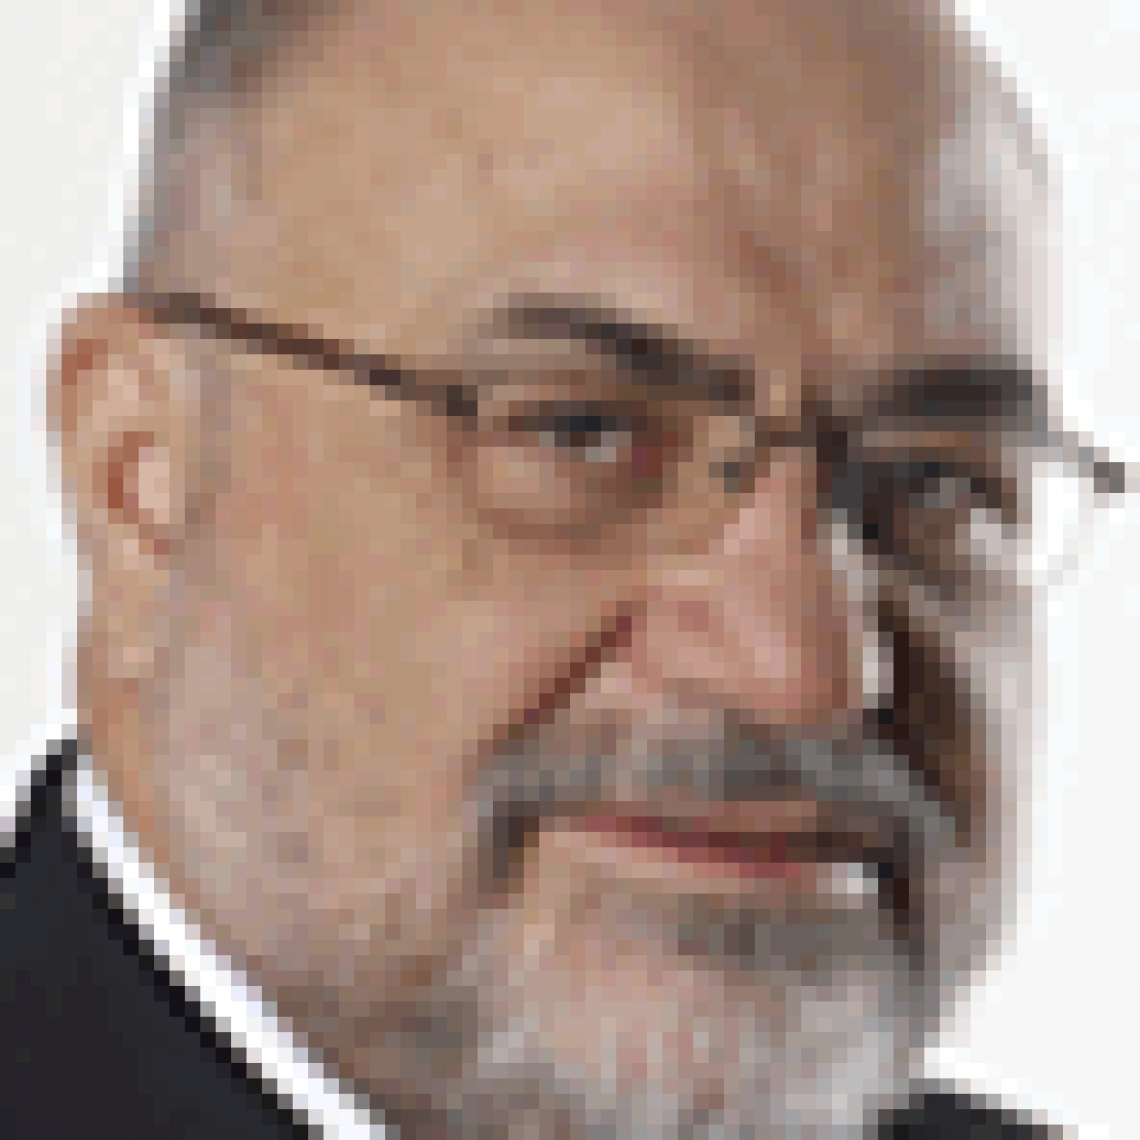 Valdemar Menezes